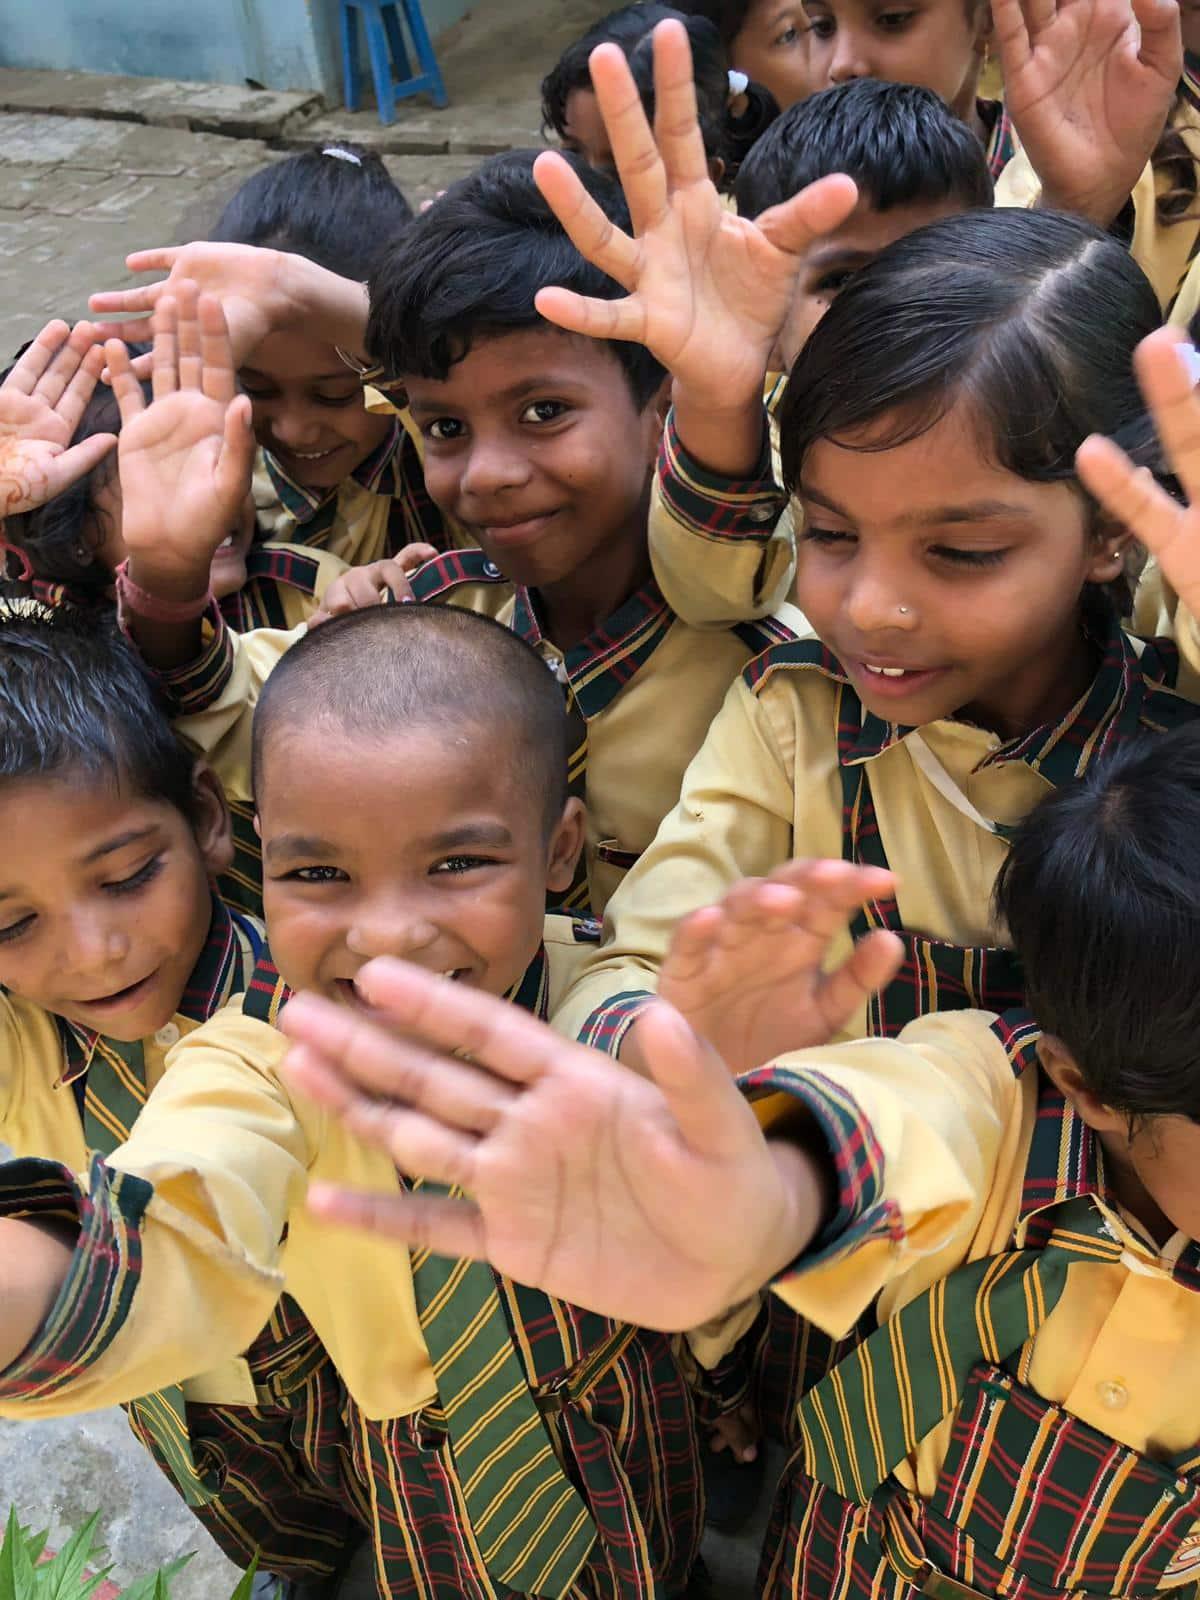 Kinder der LIght of Love Schule in Varanasi